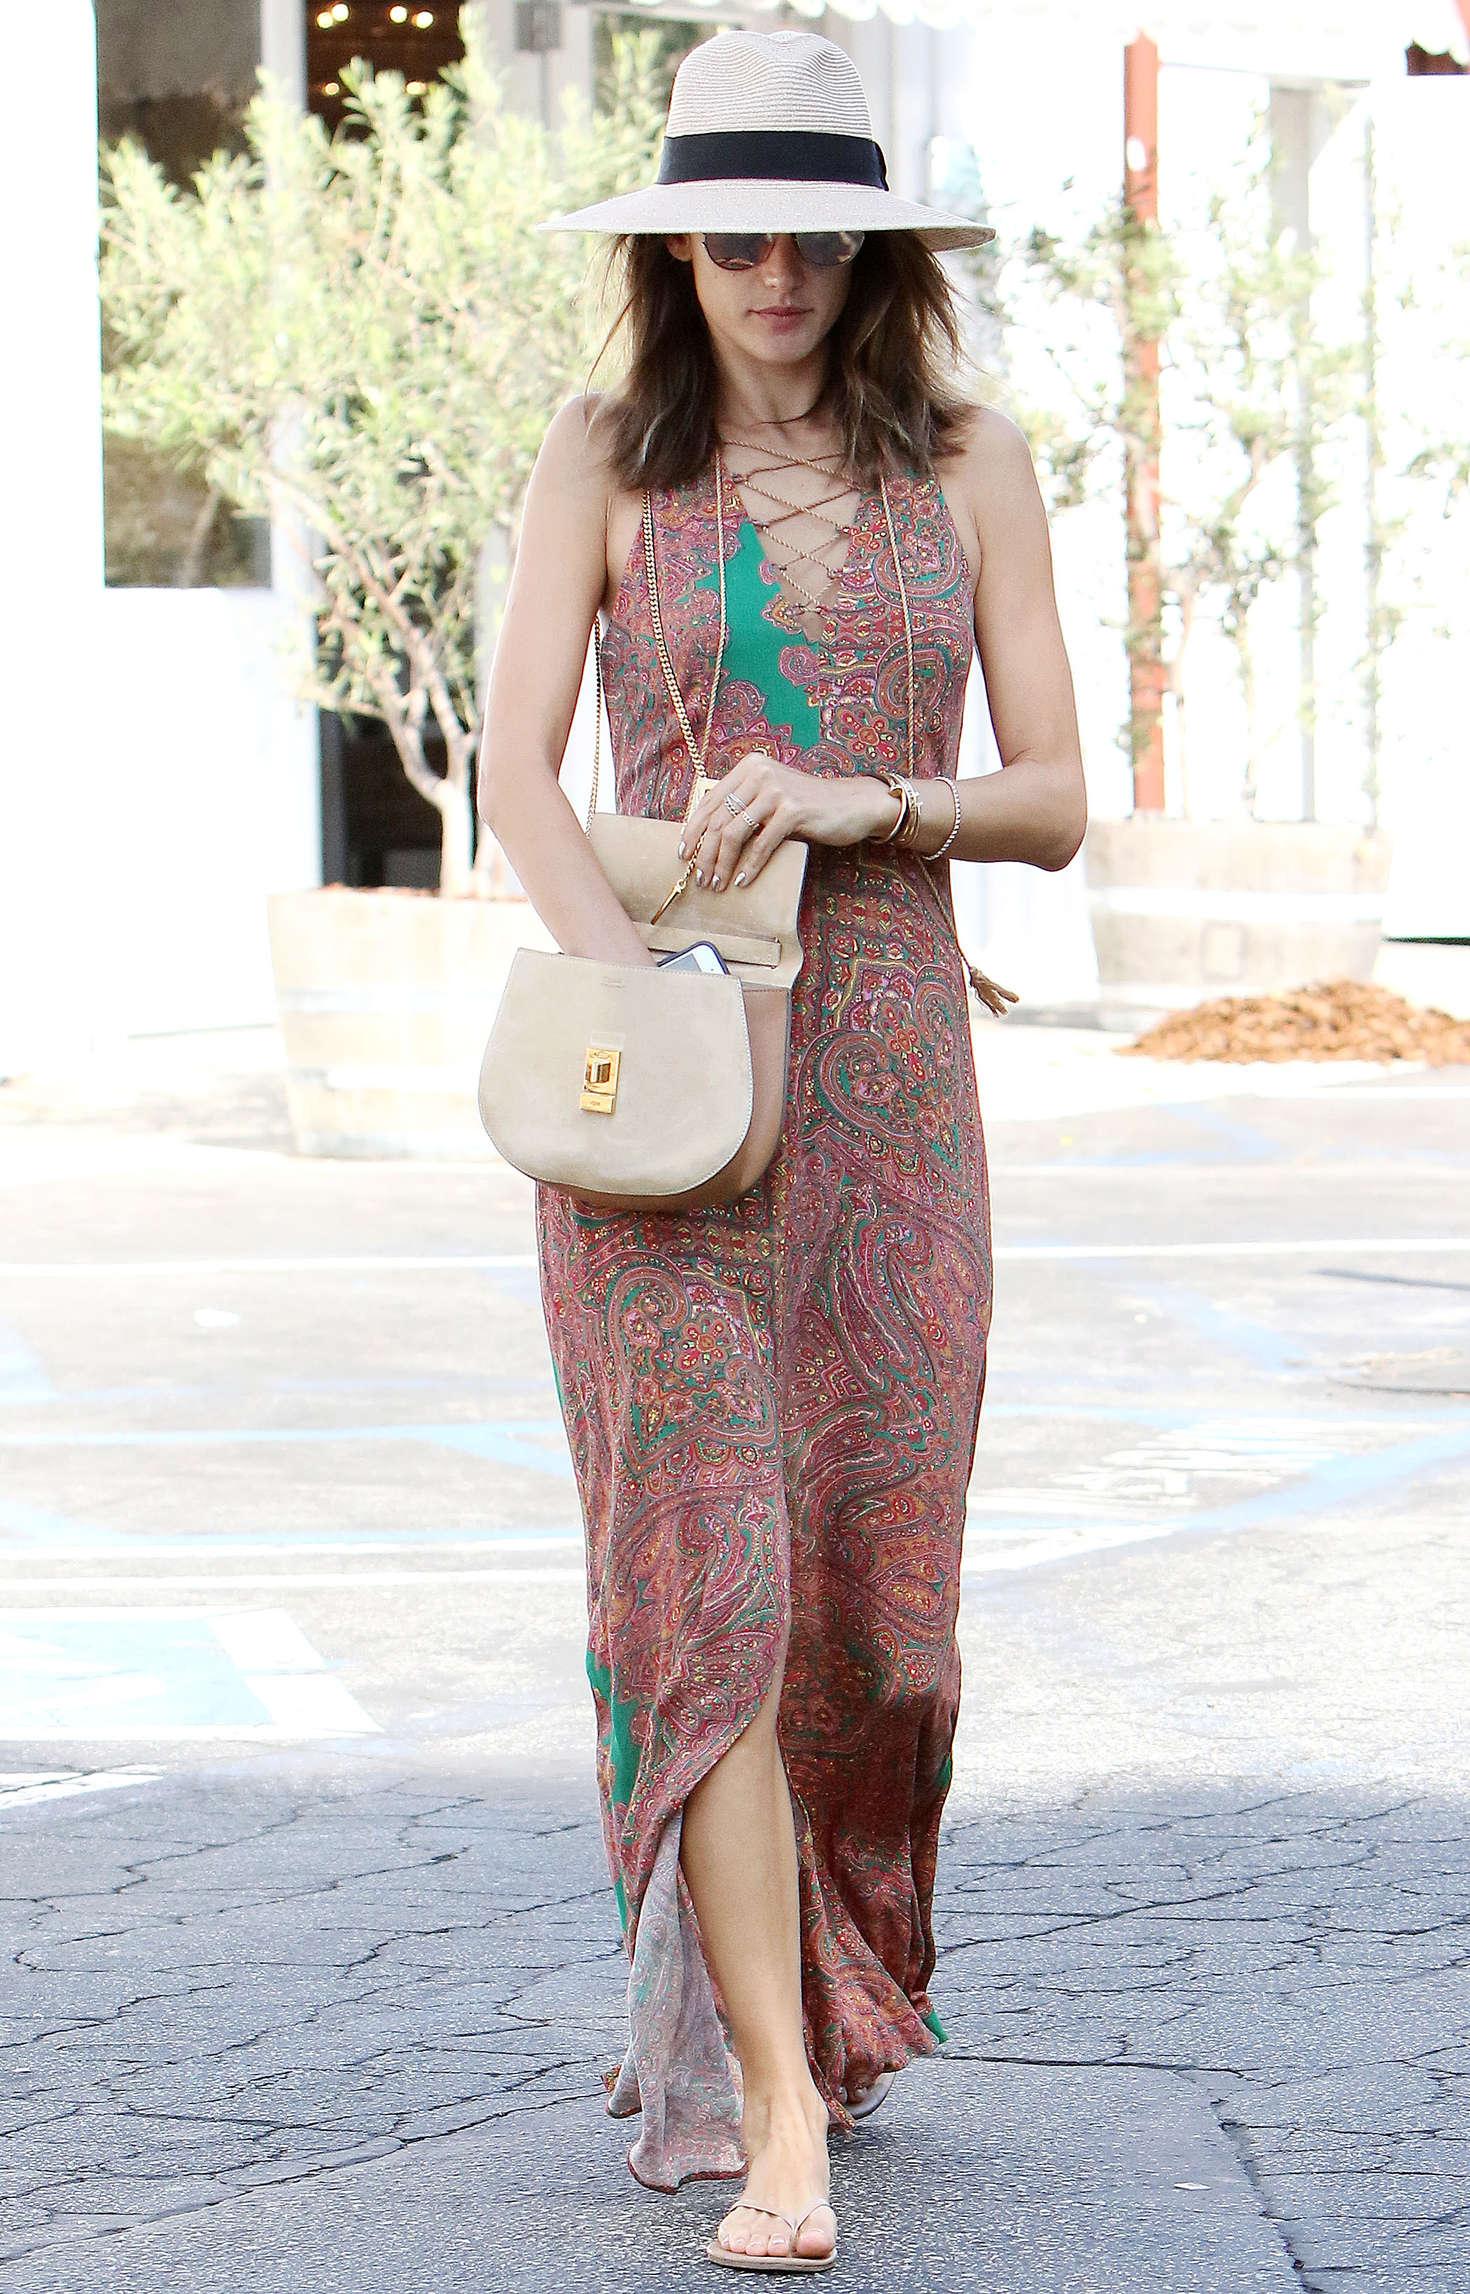 Alessandra Ambrosio 2016 : Alessandra Ambrosio in Long Summer Dress -18